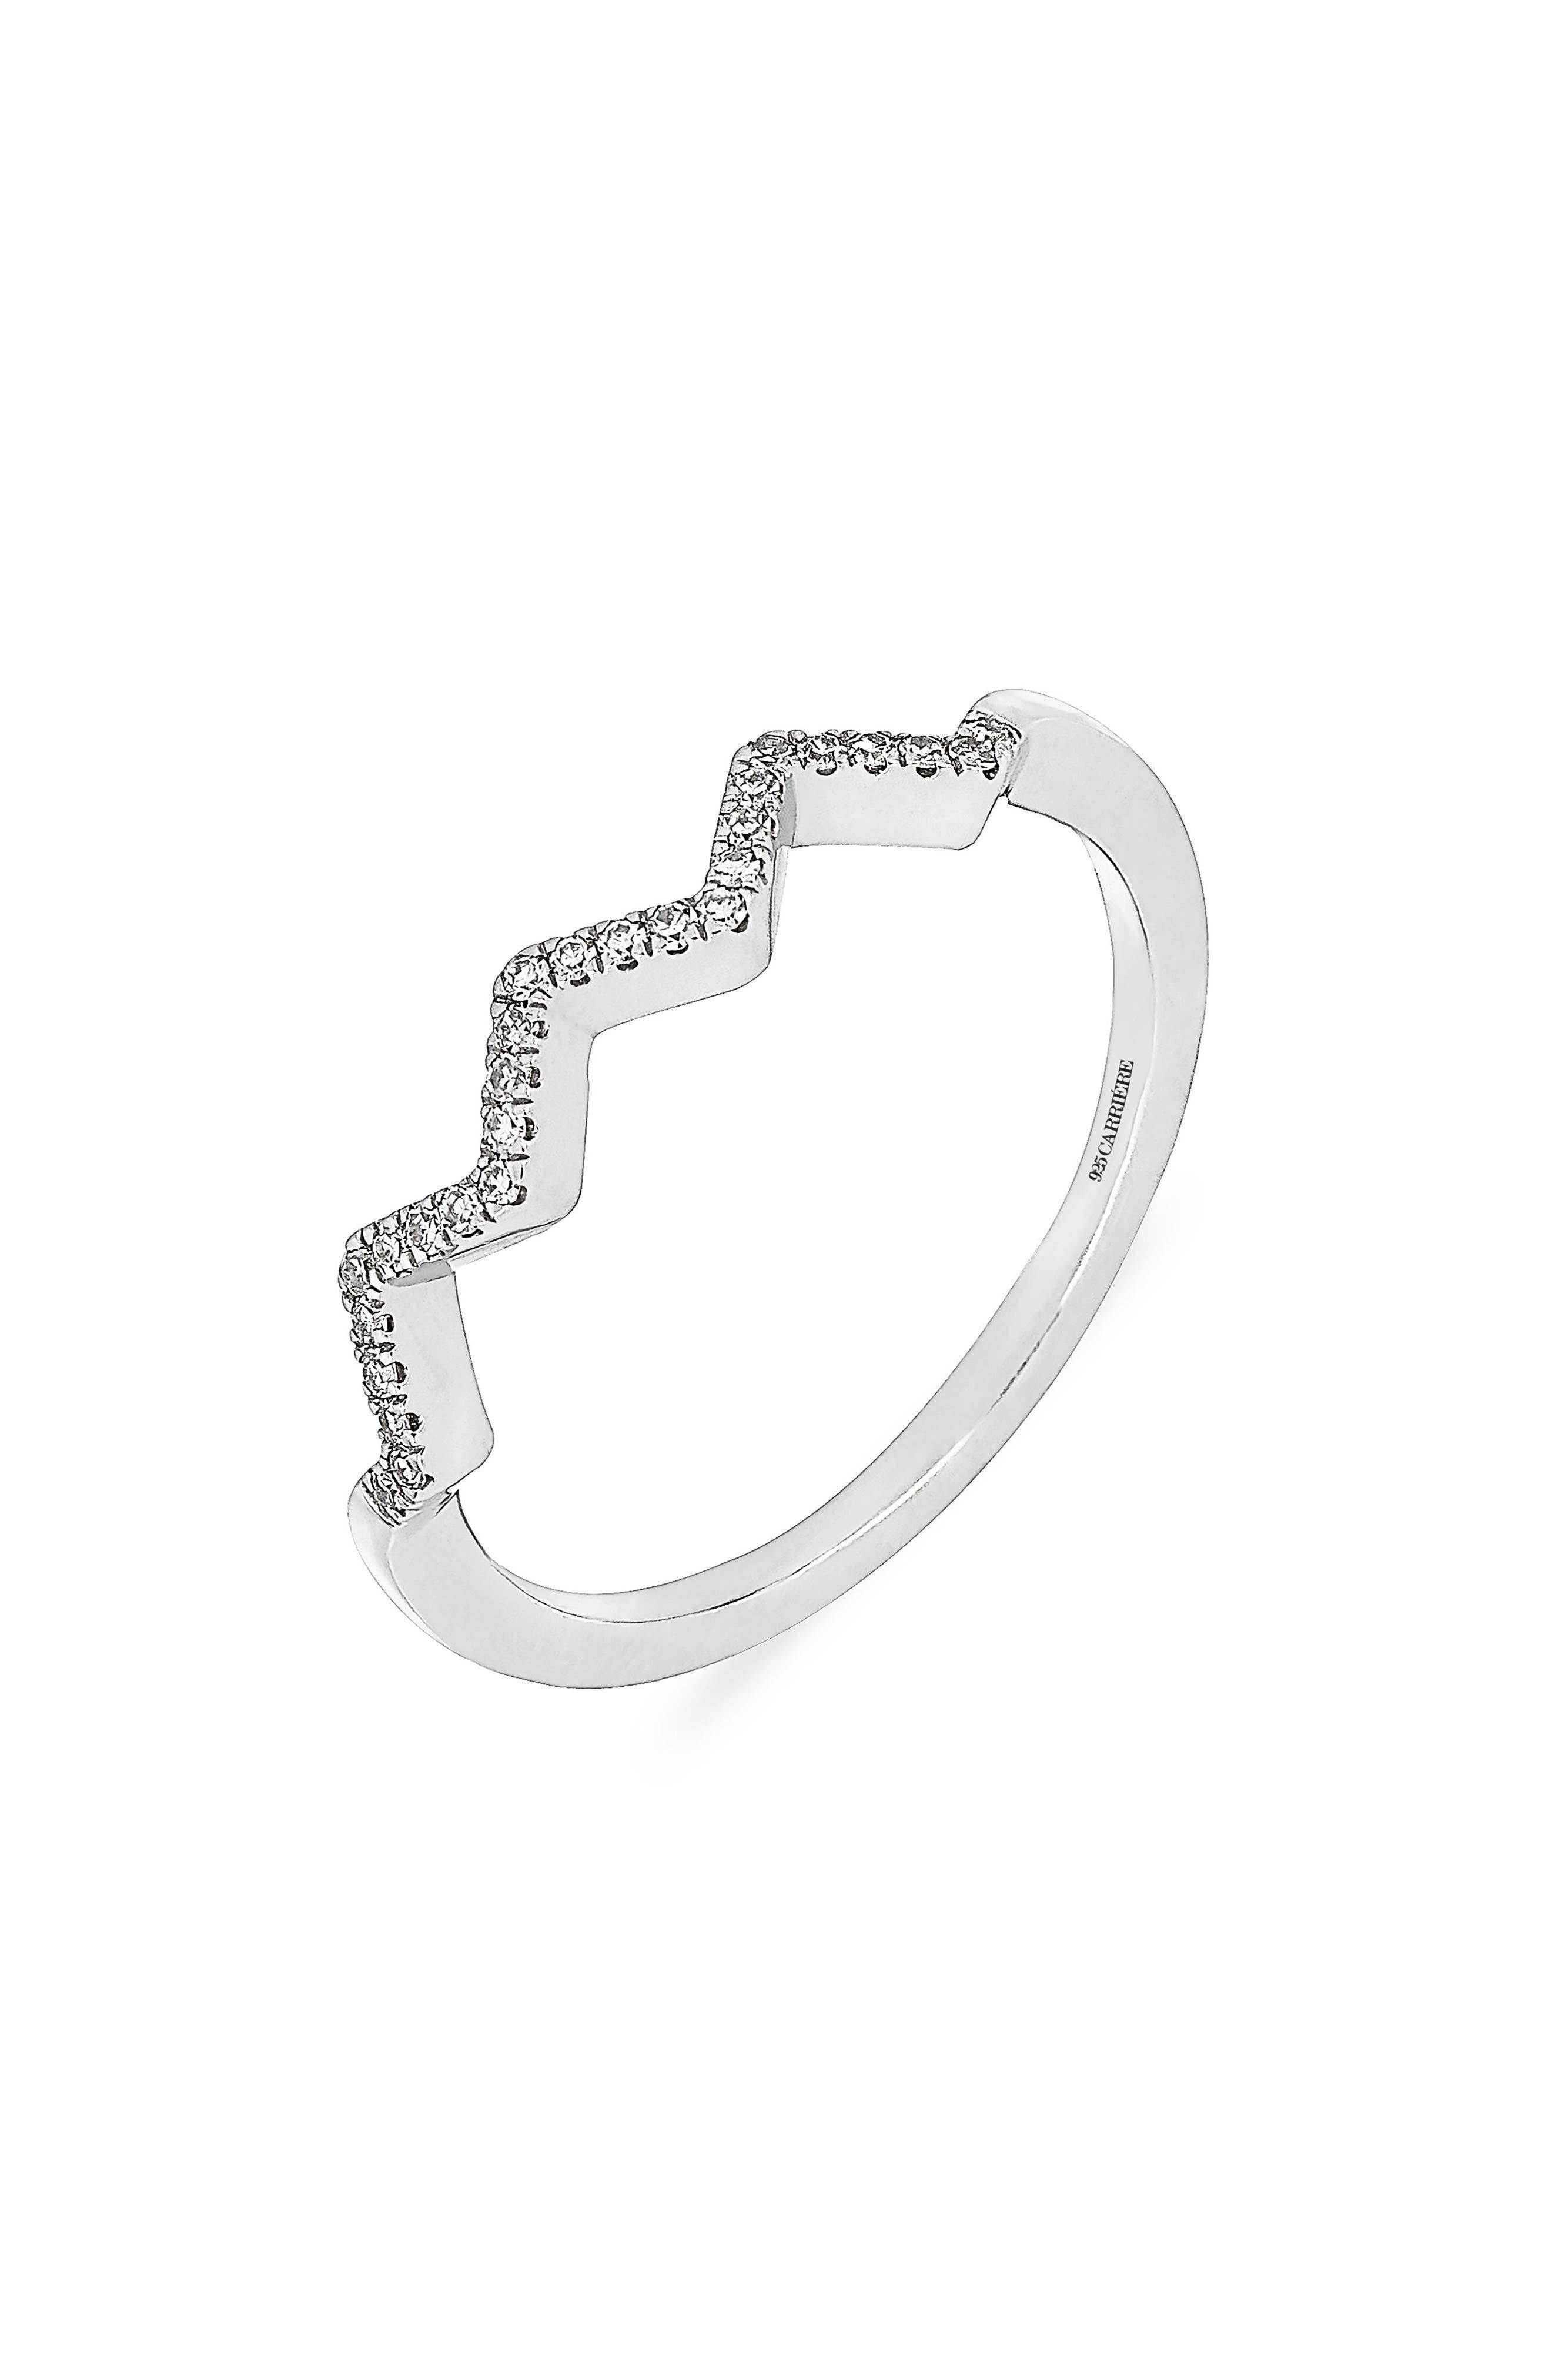 Carrière Zigzag Diamond Ring,                             Main thumbnail 1, color,                             040